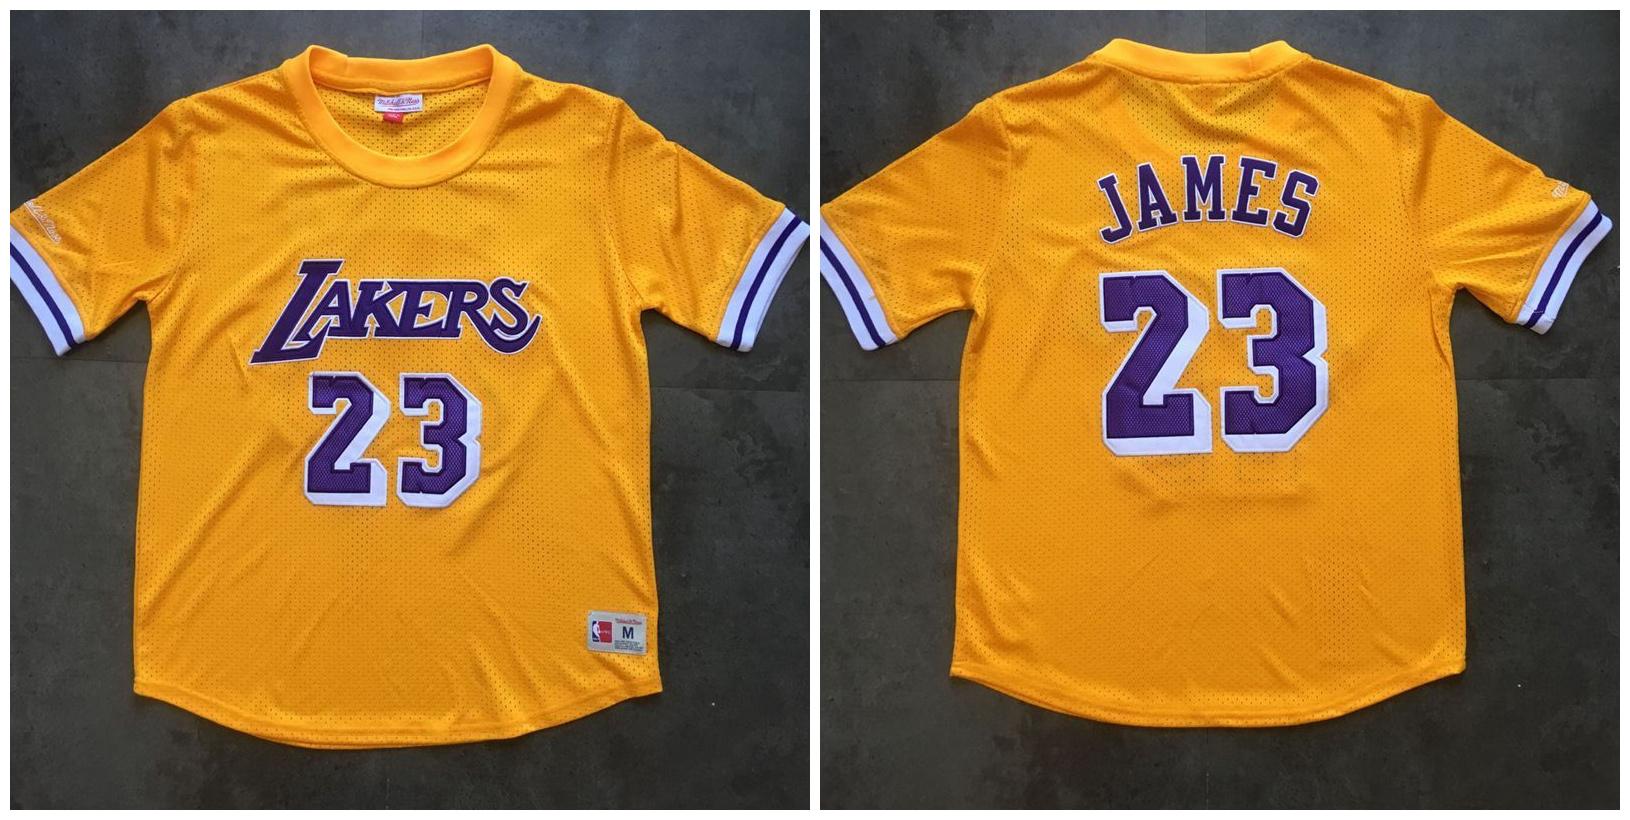 Lakers 23 Lebron James Yellow Short Sleeve Mitchell & Ness Jersey